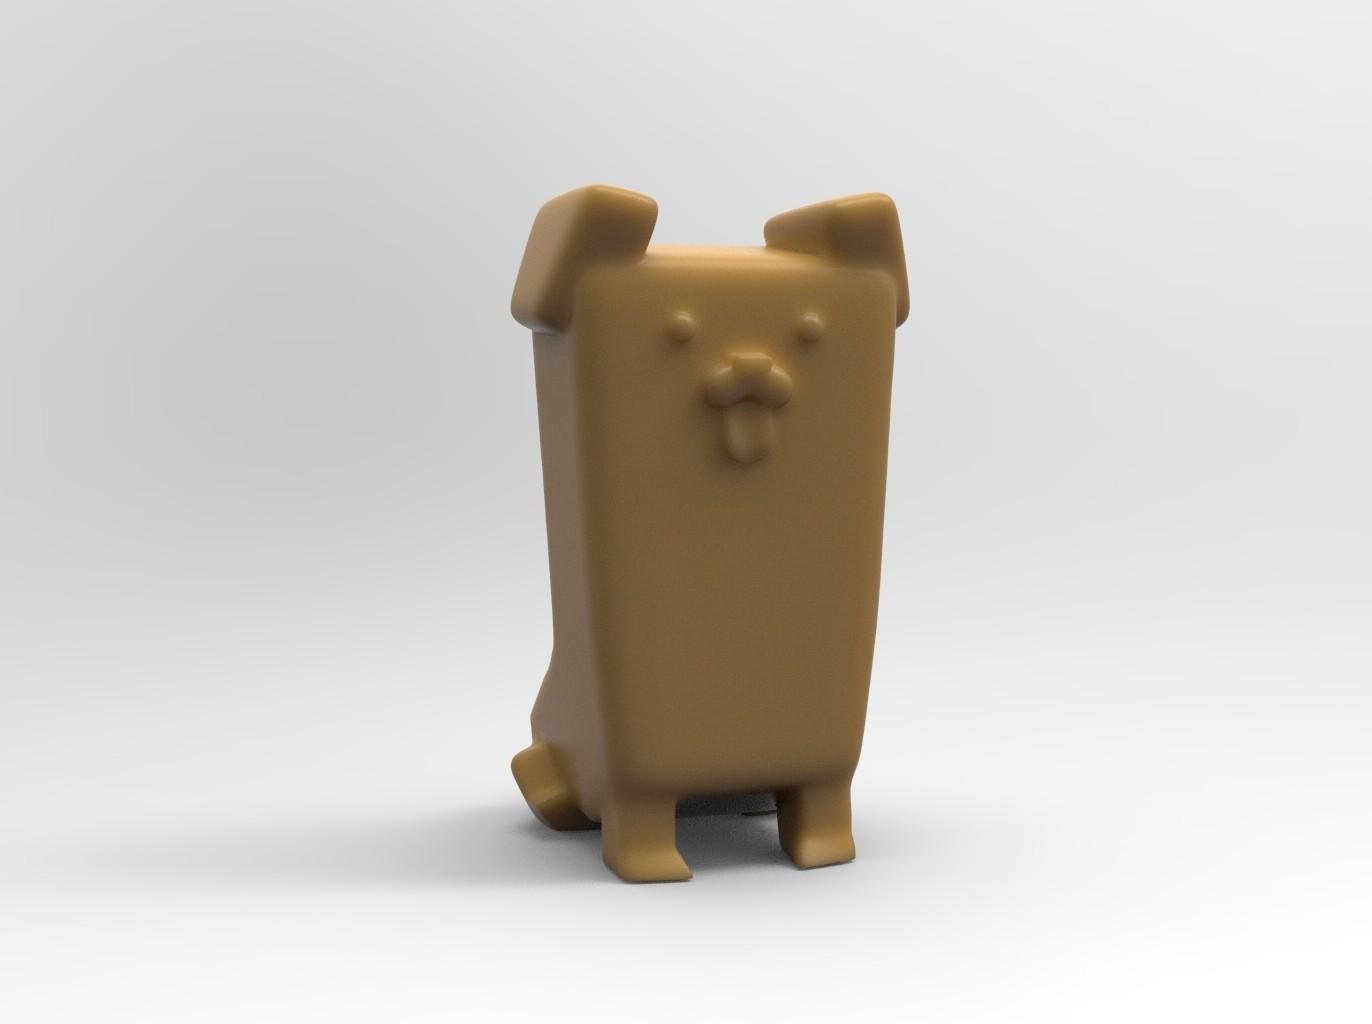 canesitting.jpg Download free STL file Un cane (a dog) seduto • 3D printing model, thePixelsChips